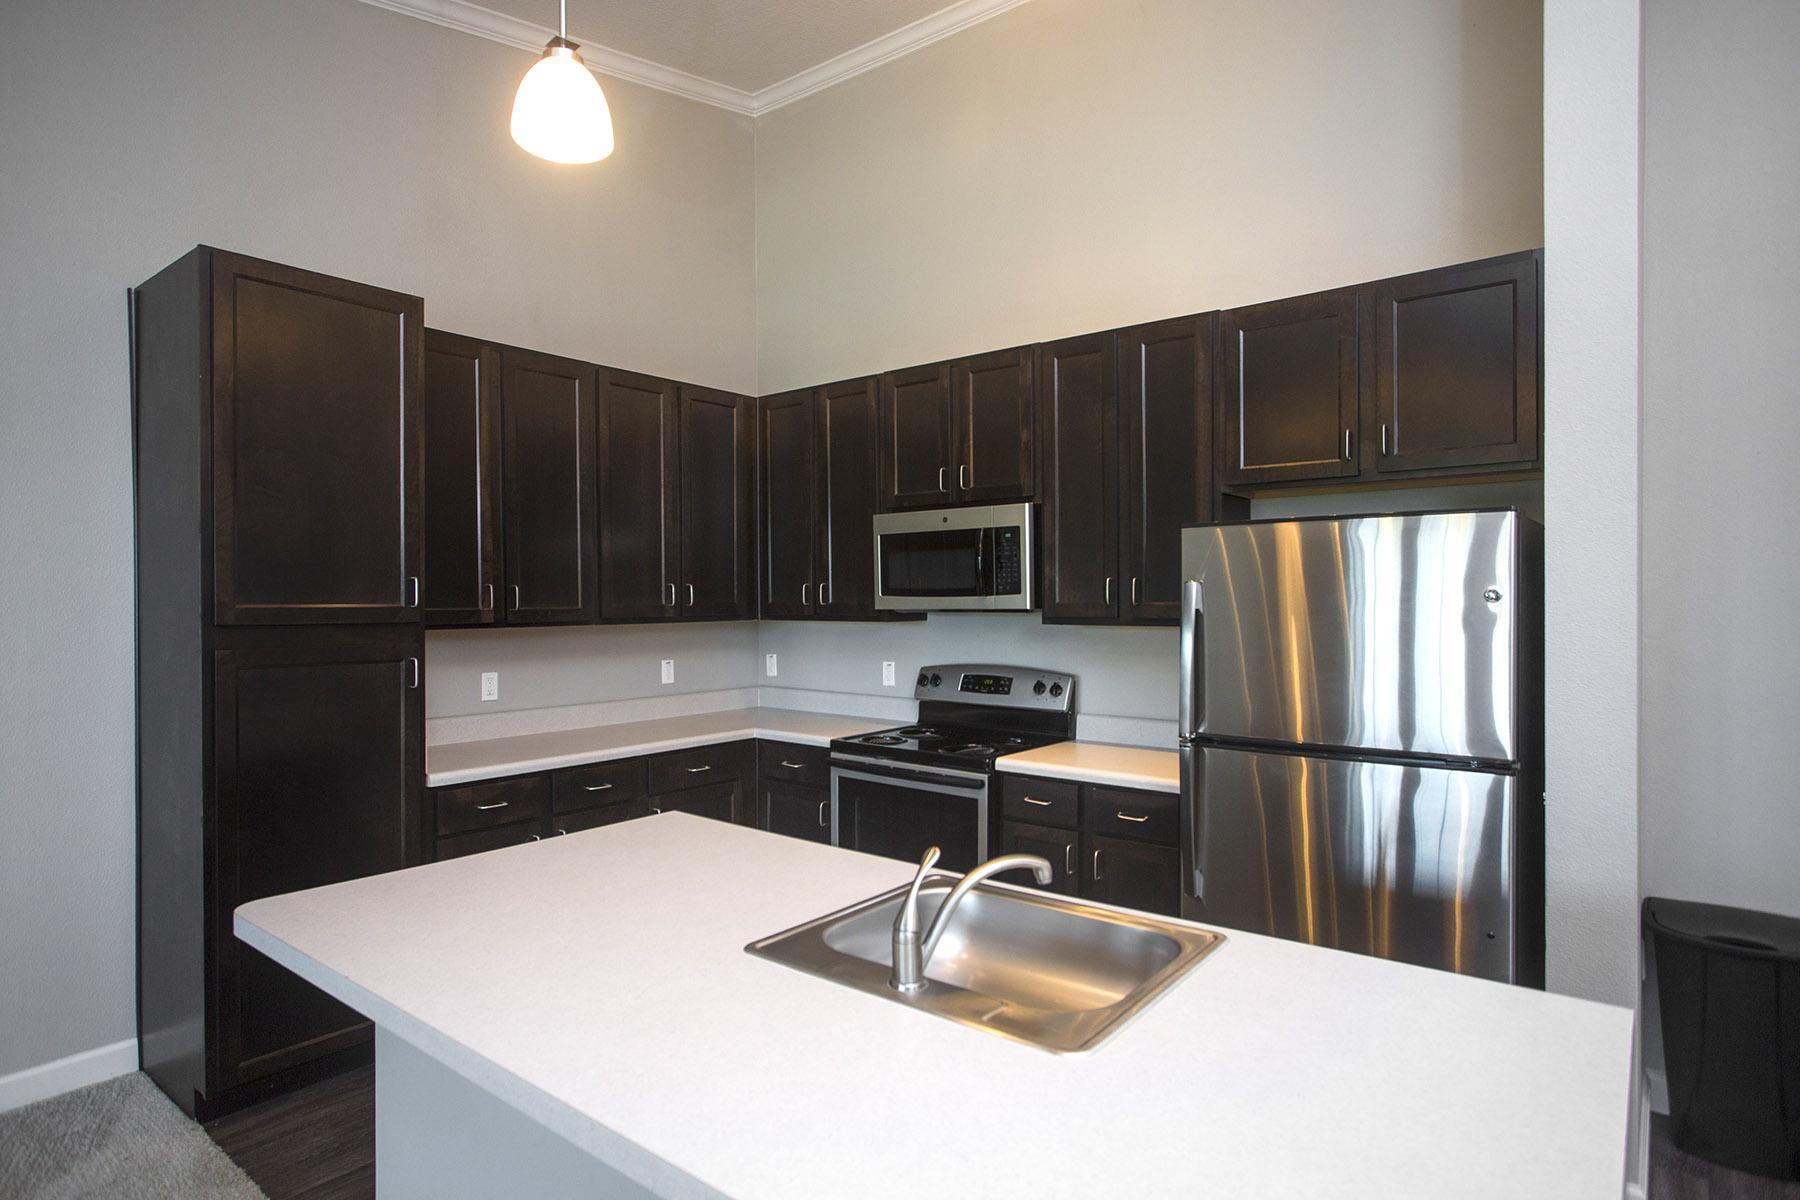 CharlestonEdge-Rental-Apartment-Brandon-Tampa-Florida-Pool-Bedrooms-Kitchen1.jpg